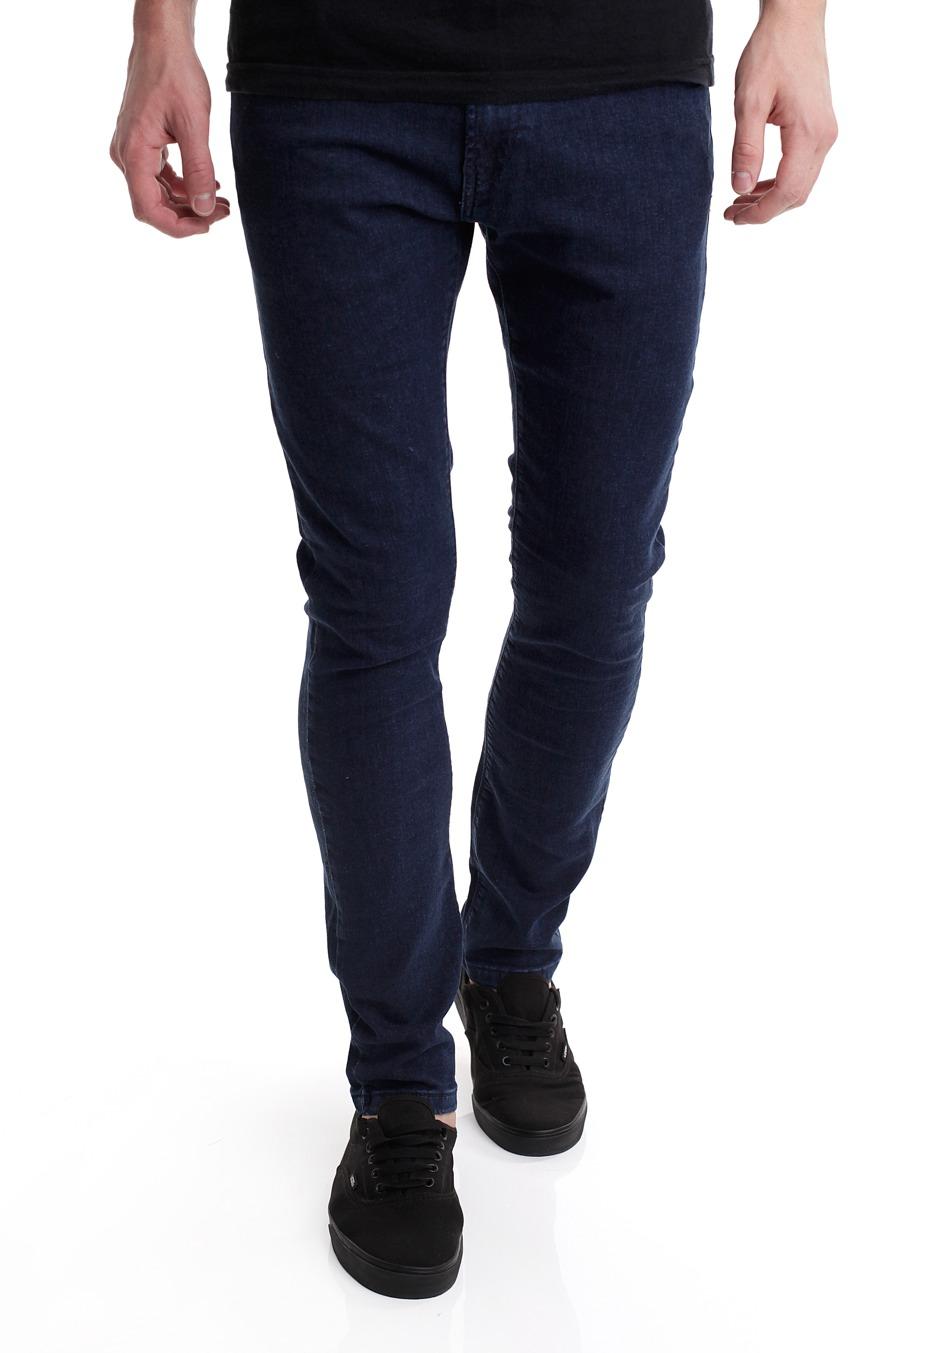 Bershka slim fit cropped jeans in mid blue with shoe lace belt. $ Bershka slim fit cropped jeans in black with shoe lace belt. $ G-Star deconstructed overdye slim jeans oxide ocre. $ ASOS DESIGN 'Stefan' skinny jeans in black vinyl with zip hem. $